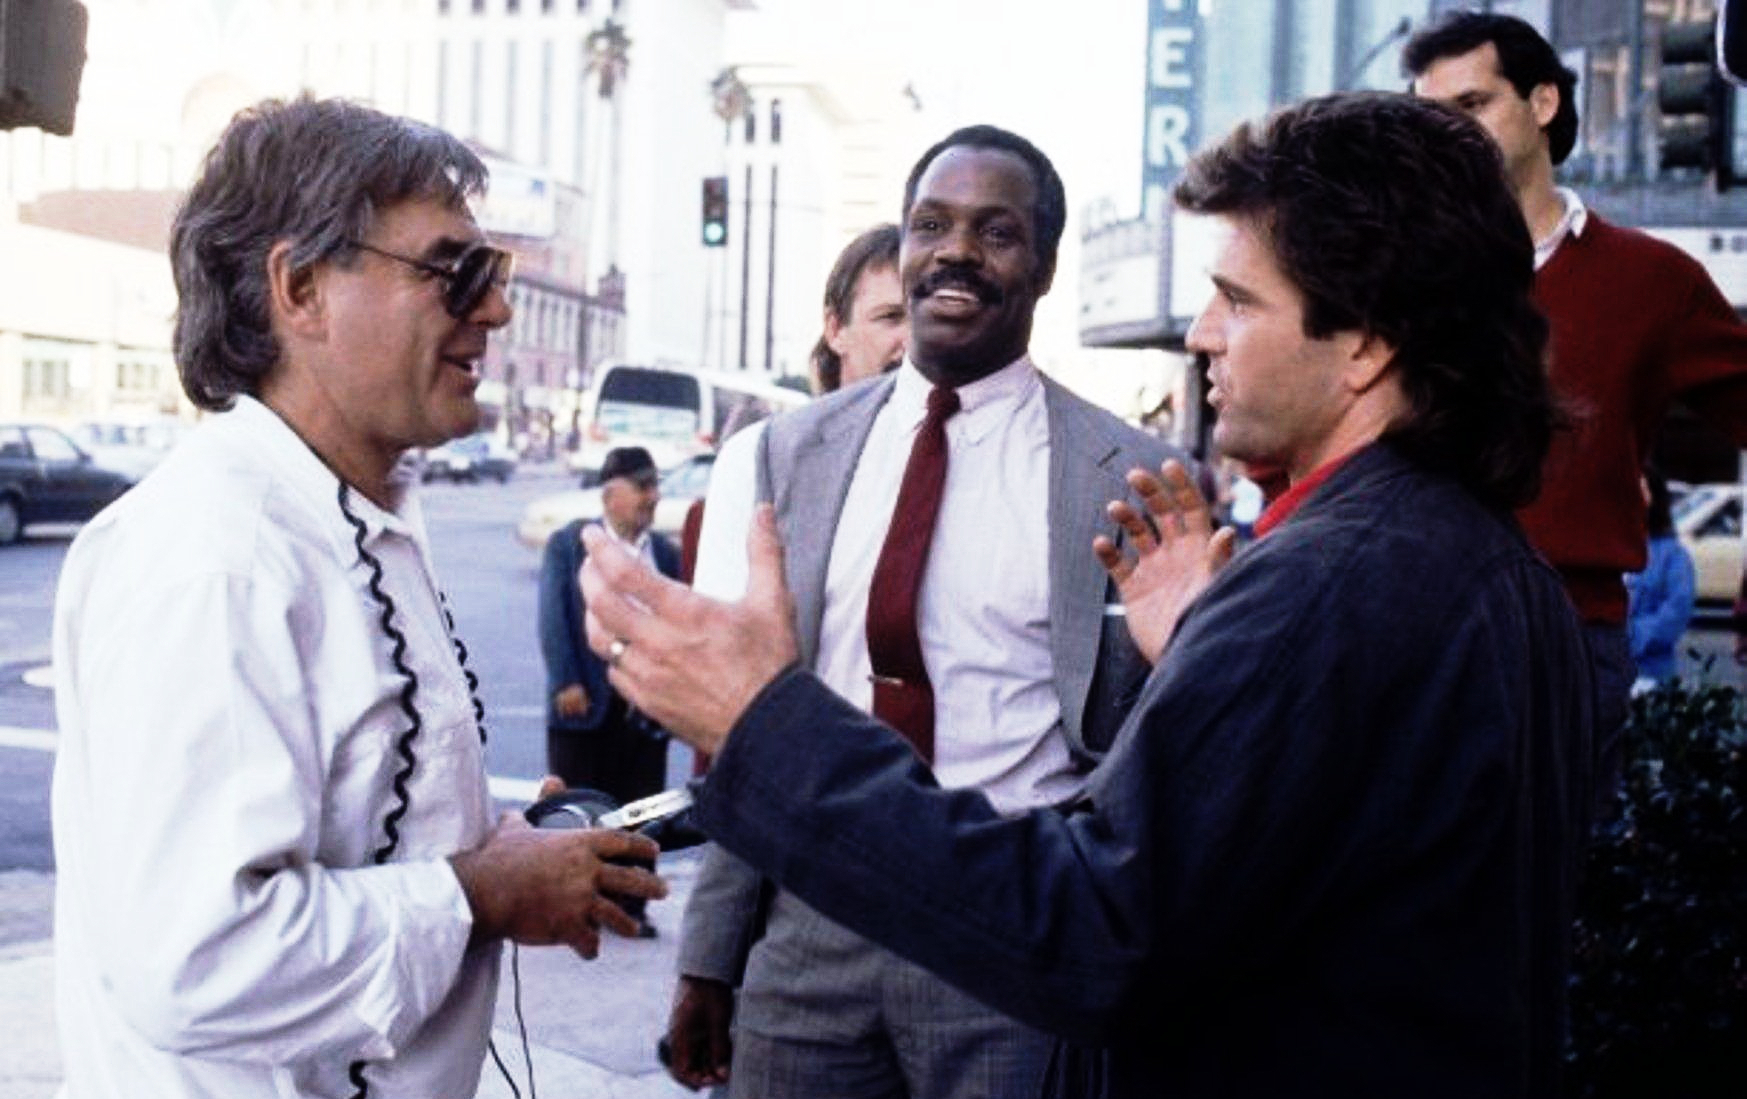 Smrtonosná zbraň 5: Po Gibsonovi a Gloverovi potvrdil pětku i sám režisér